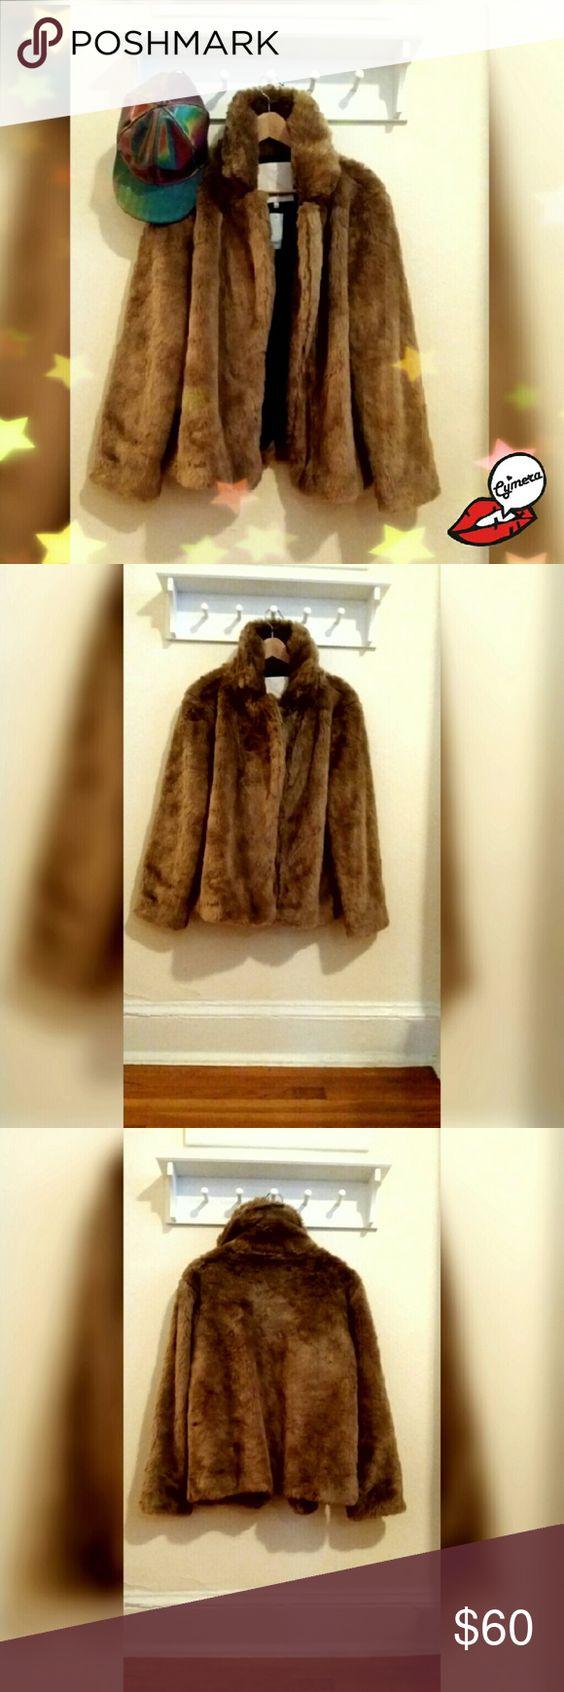 Faux Fur Jacket Tan, plush, super soft faux fur jacket. Never worn. Aritzia Jackets & Coats